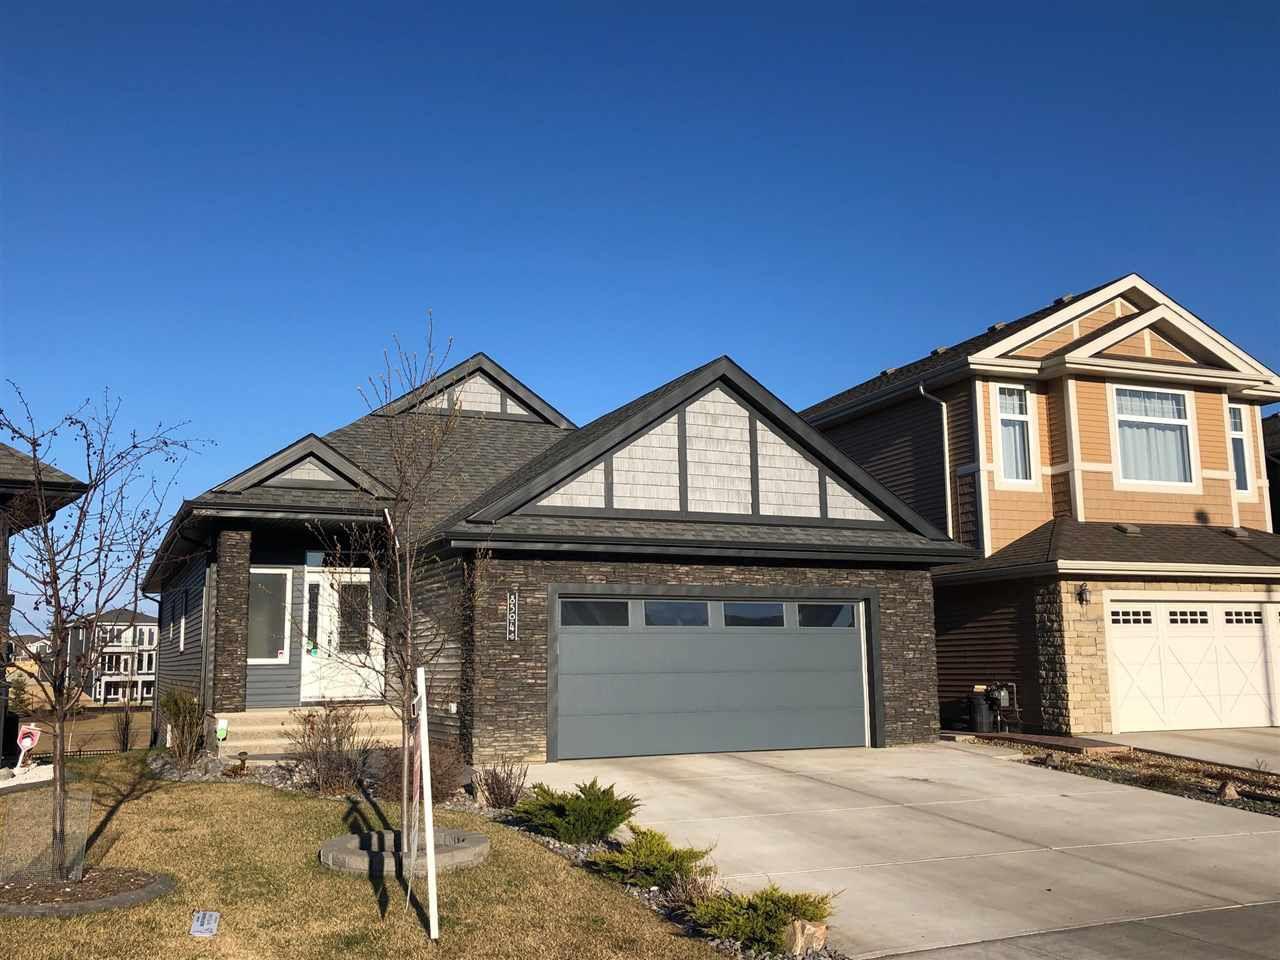 Main Photo: 8504 218 Street in Edmonton: Zone 58 House for sale : MLS®# E4158248